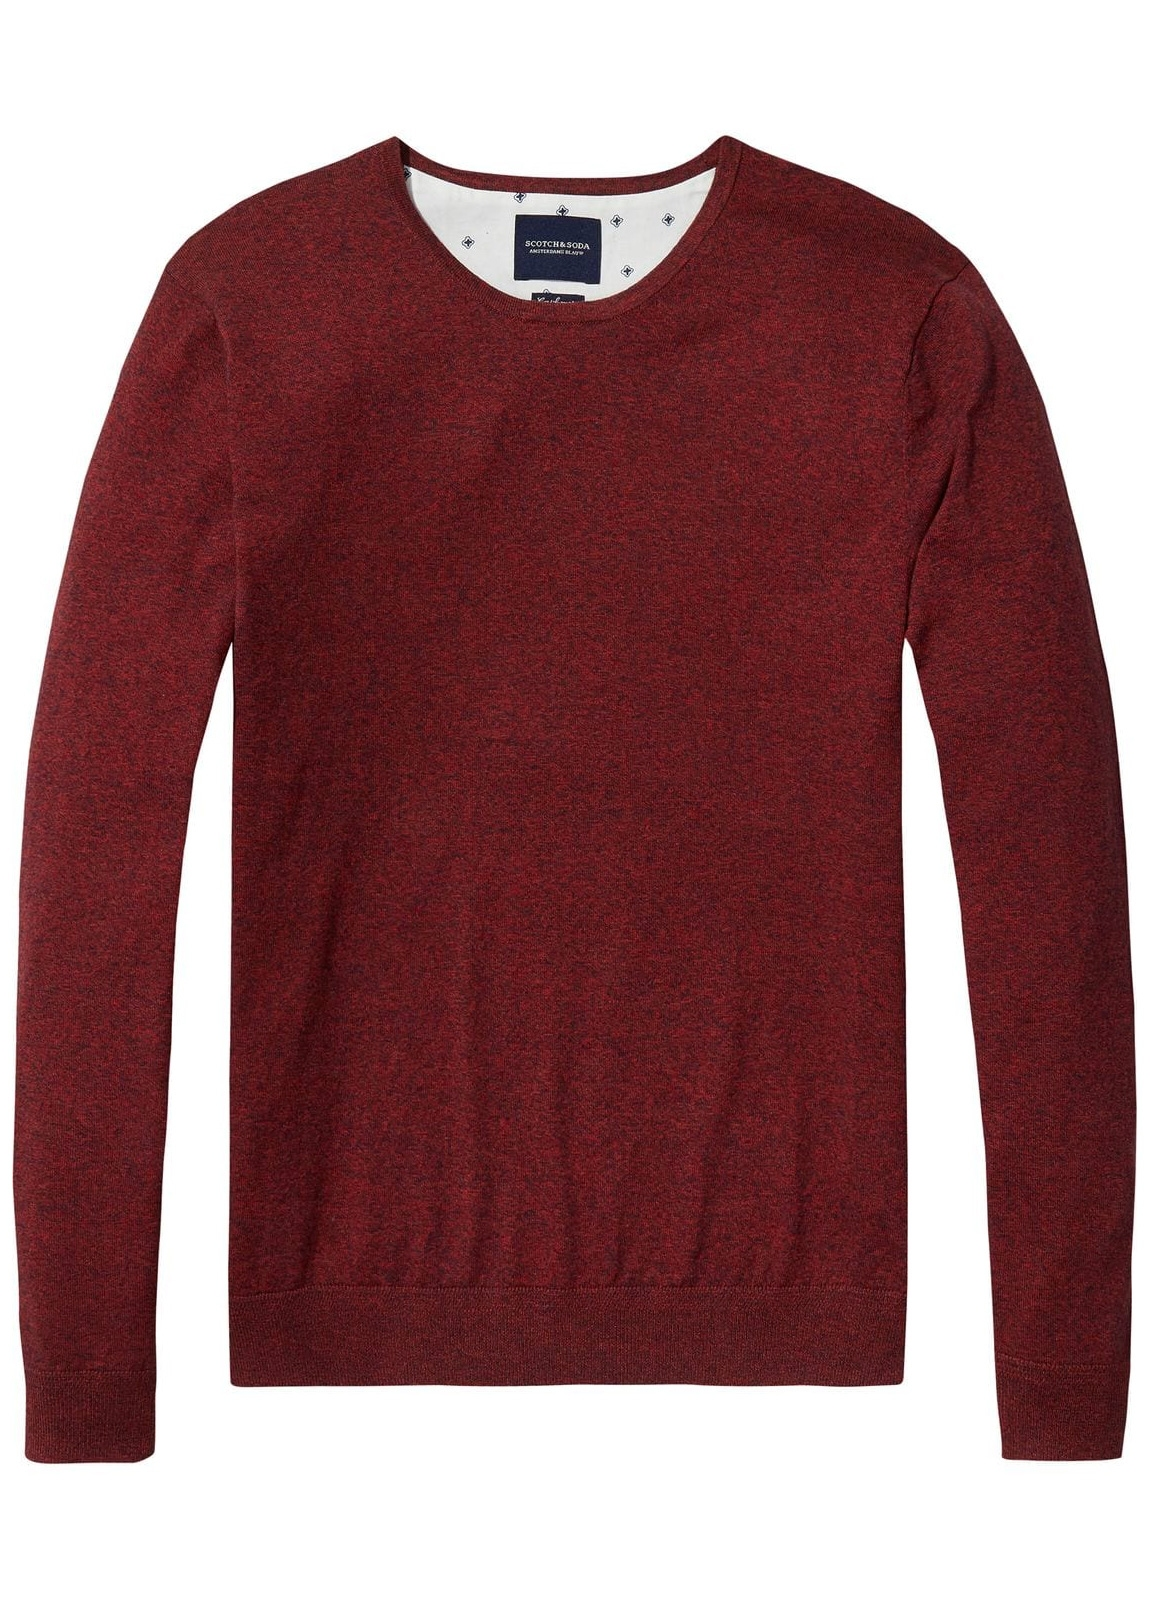 Jersey cuello redondo color granate. 95% Algodón 5% Cashmere.